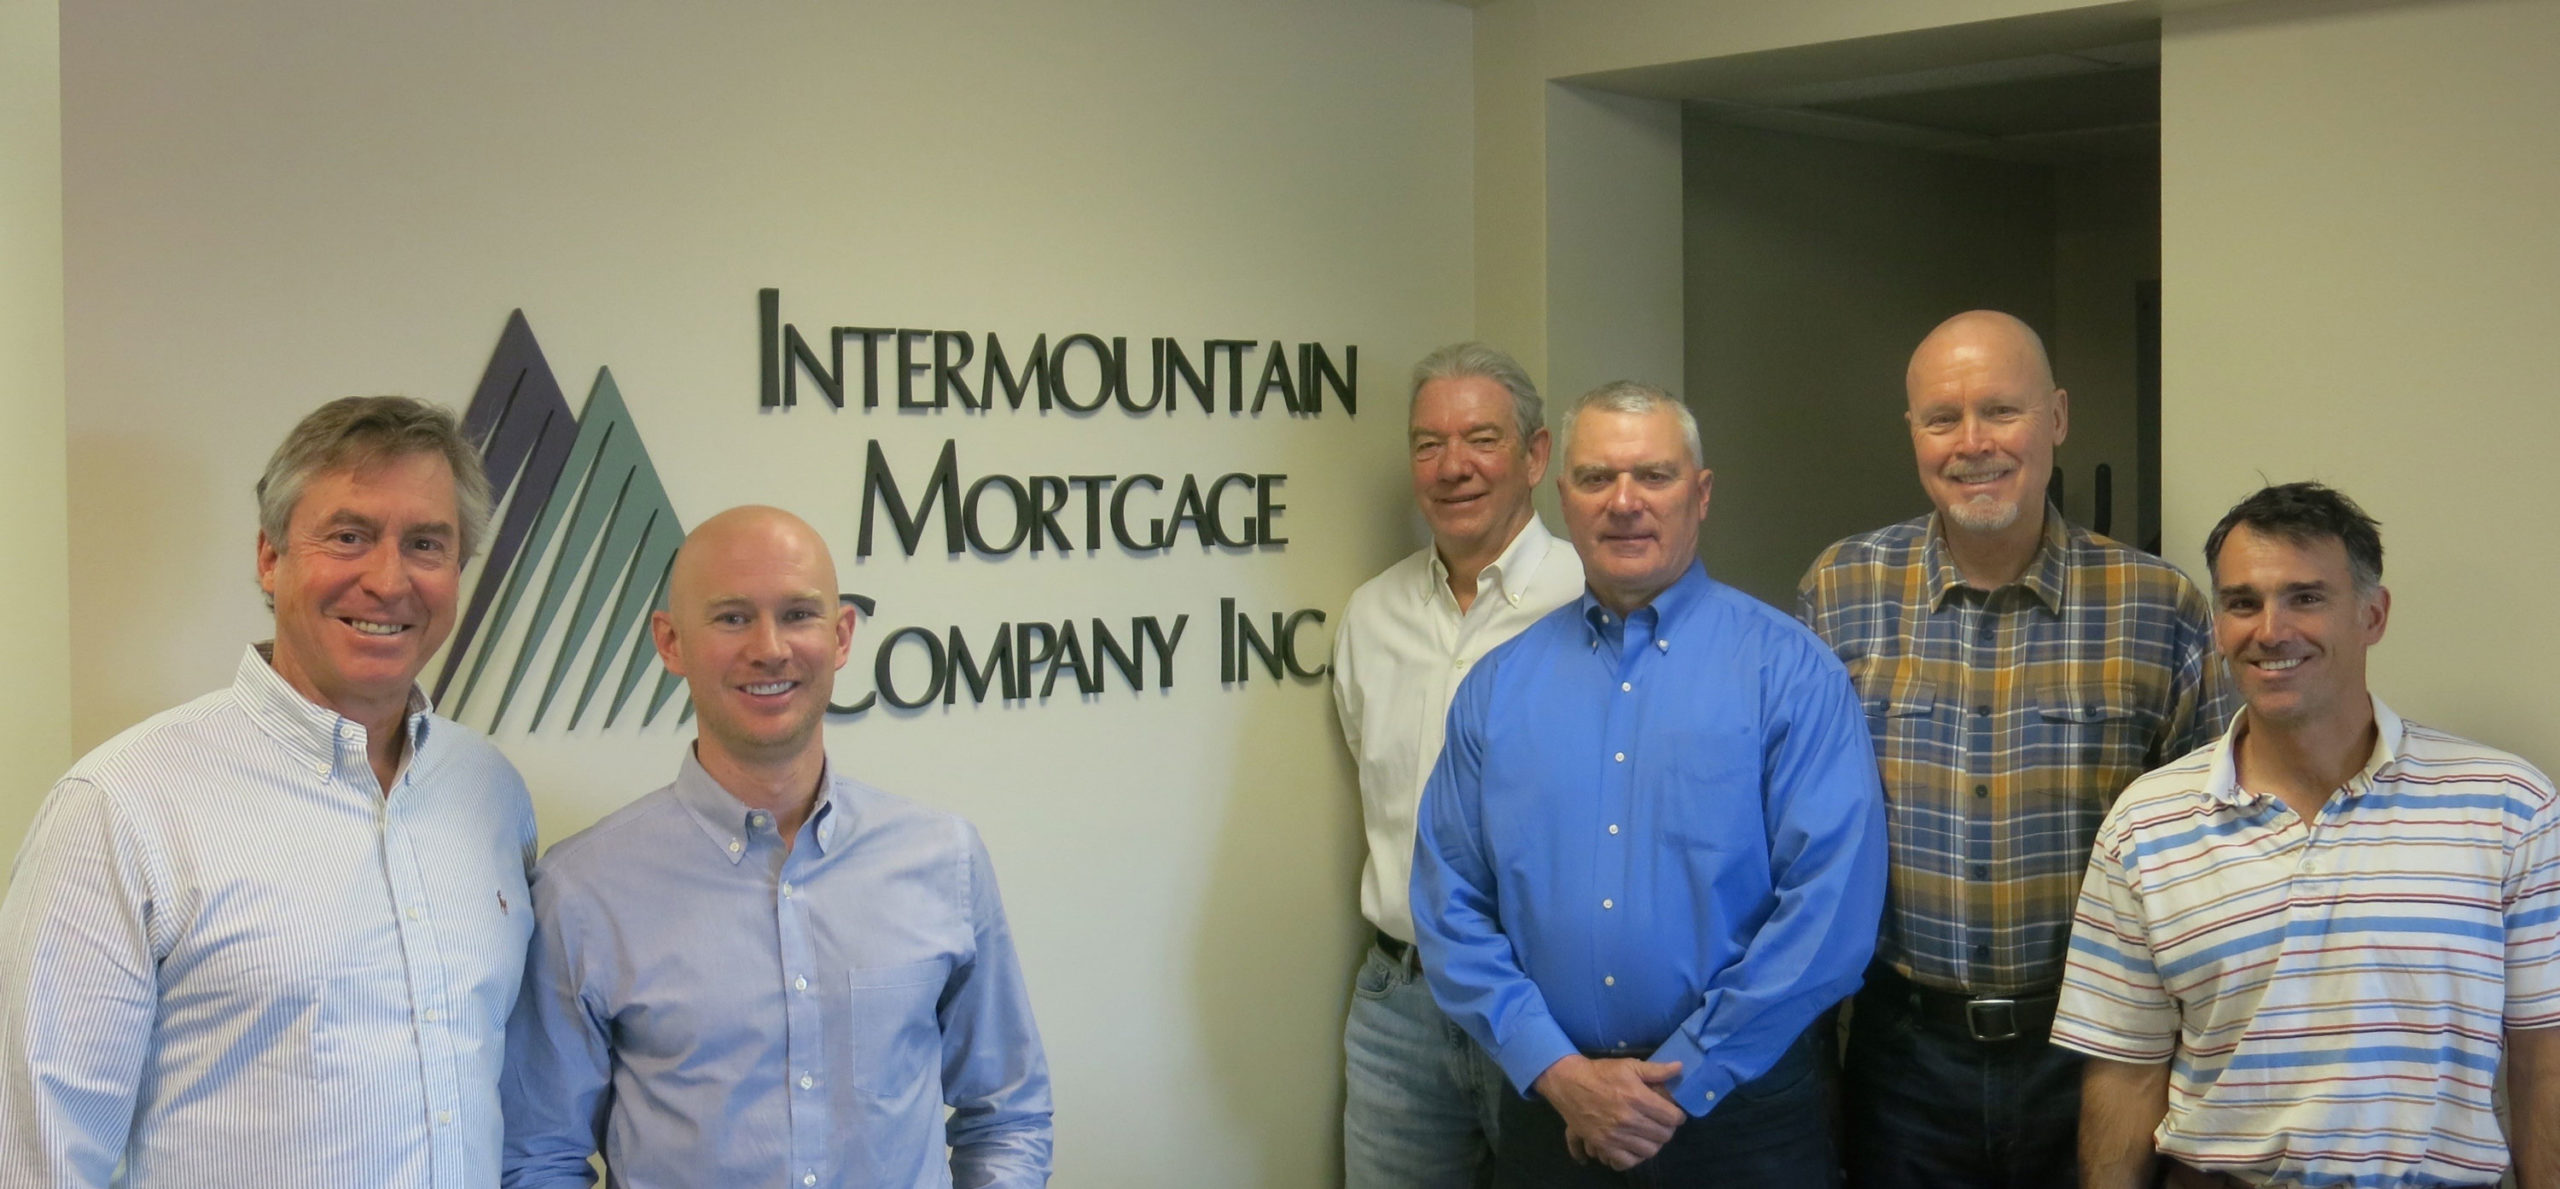 Intermountain Mortgage Company